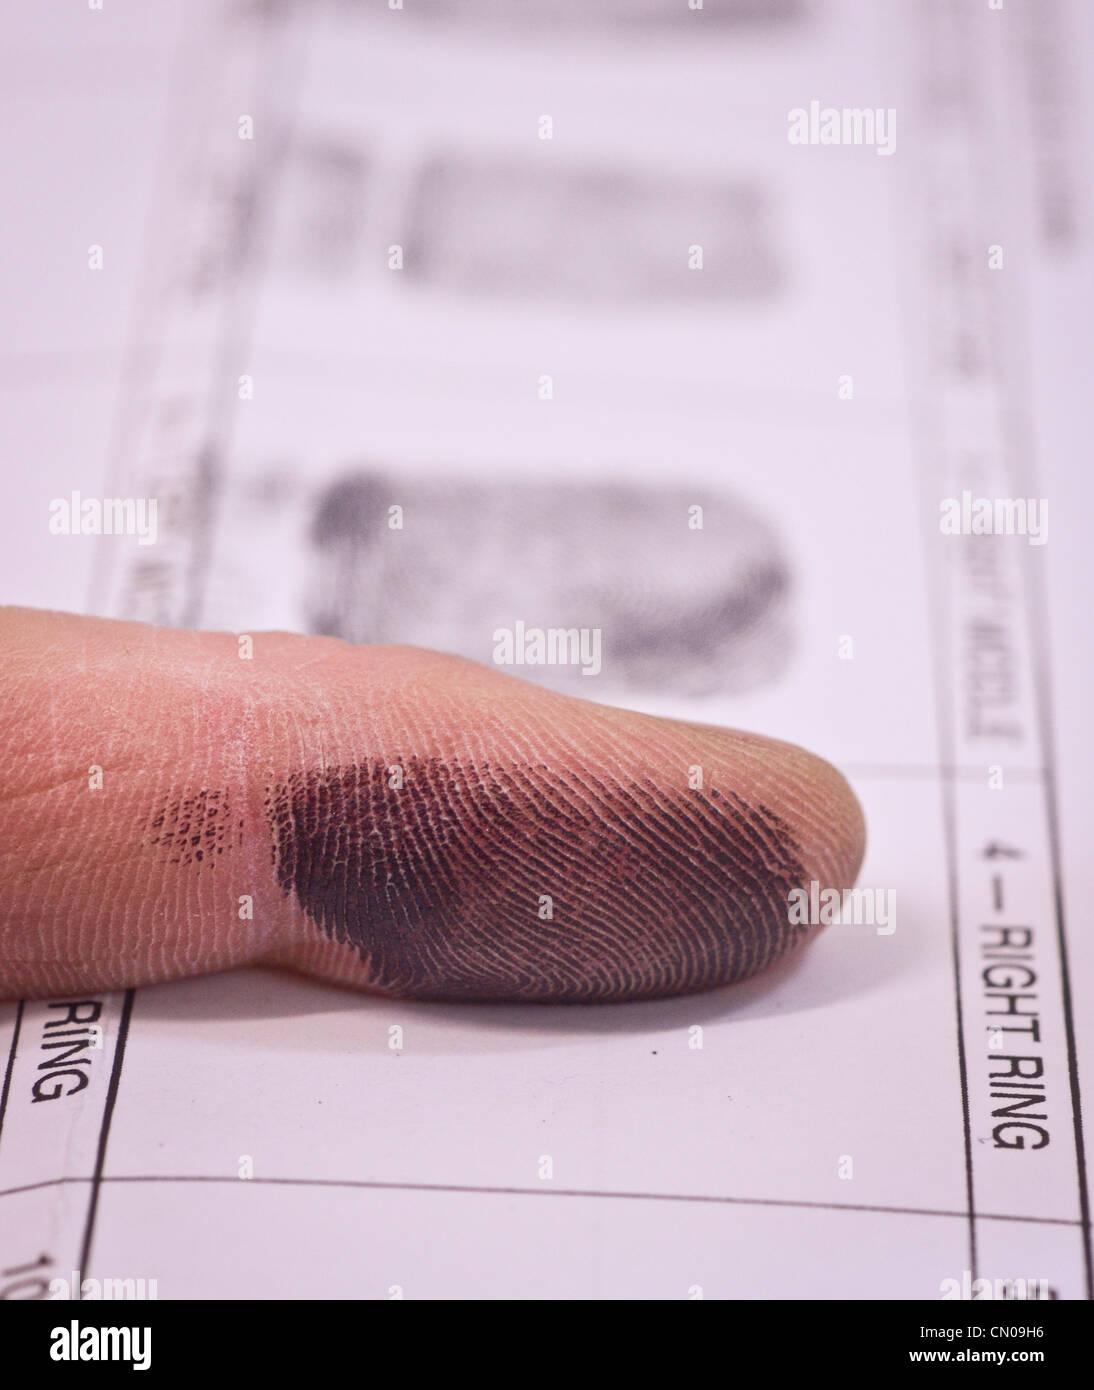 A person being having his fingerprints taken - Stock Image